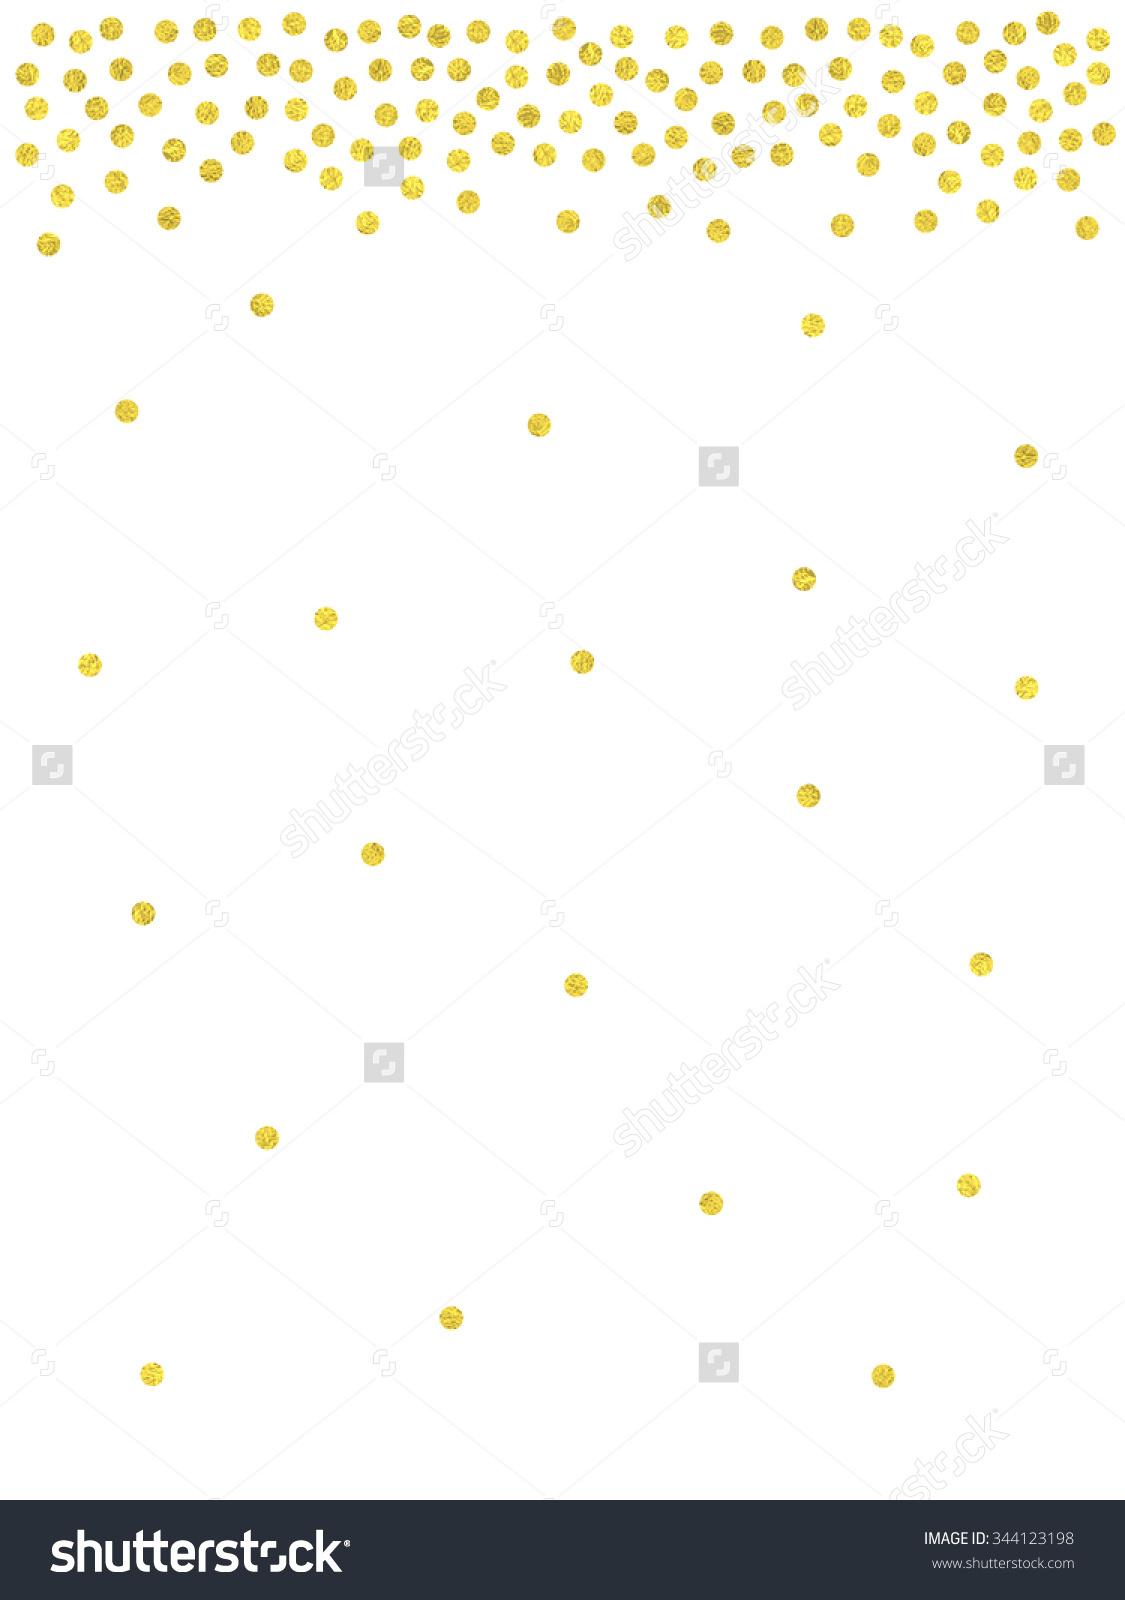 Dots clipart confetti Border Gold collection Polka dot